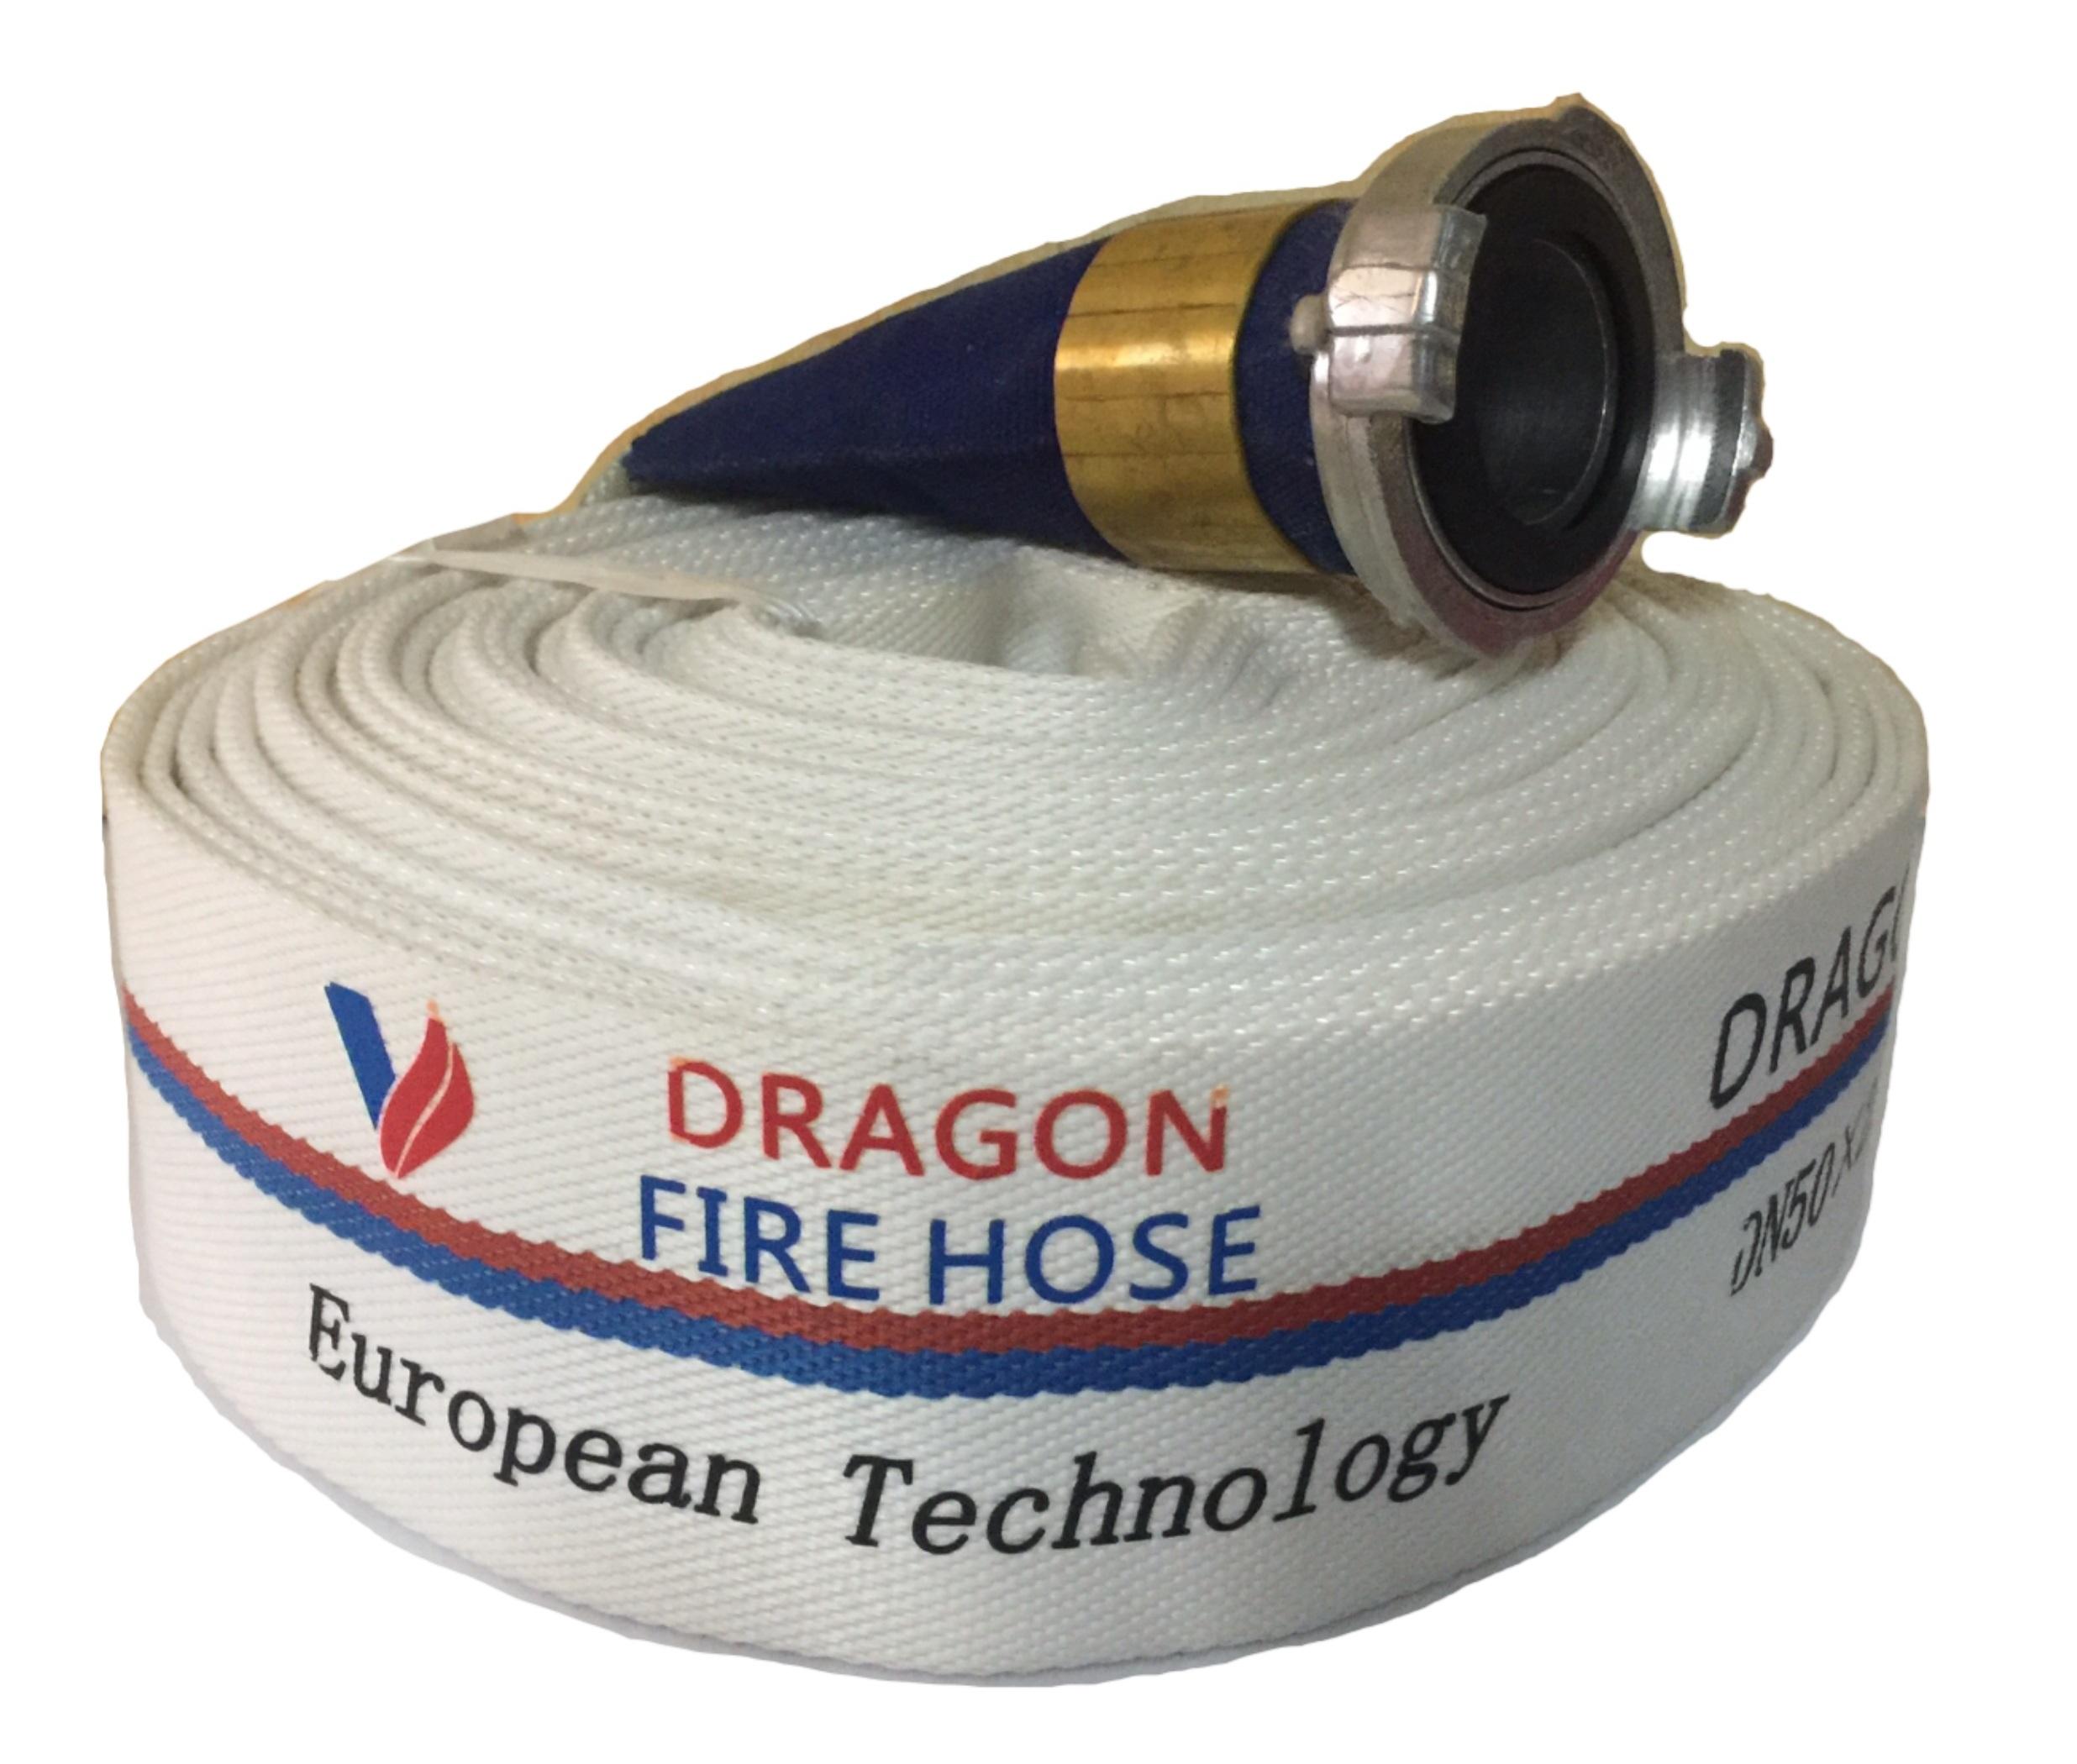 http://thietbicuuhoa.com.vn/images/2017/07/voi-chua-chay-dragon-d50.jpg